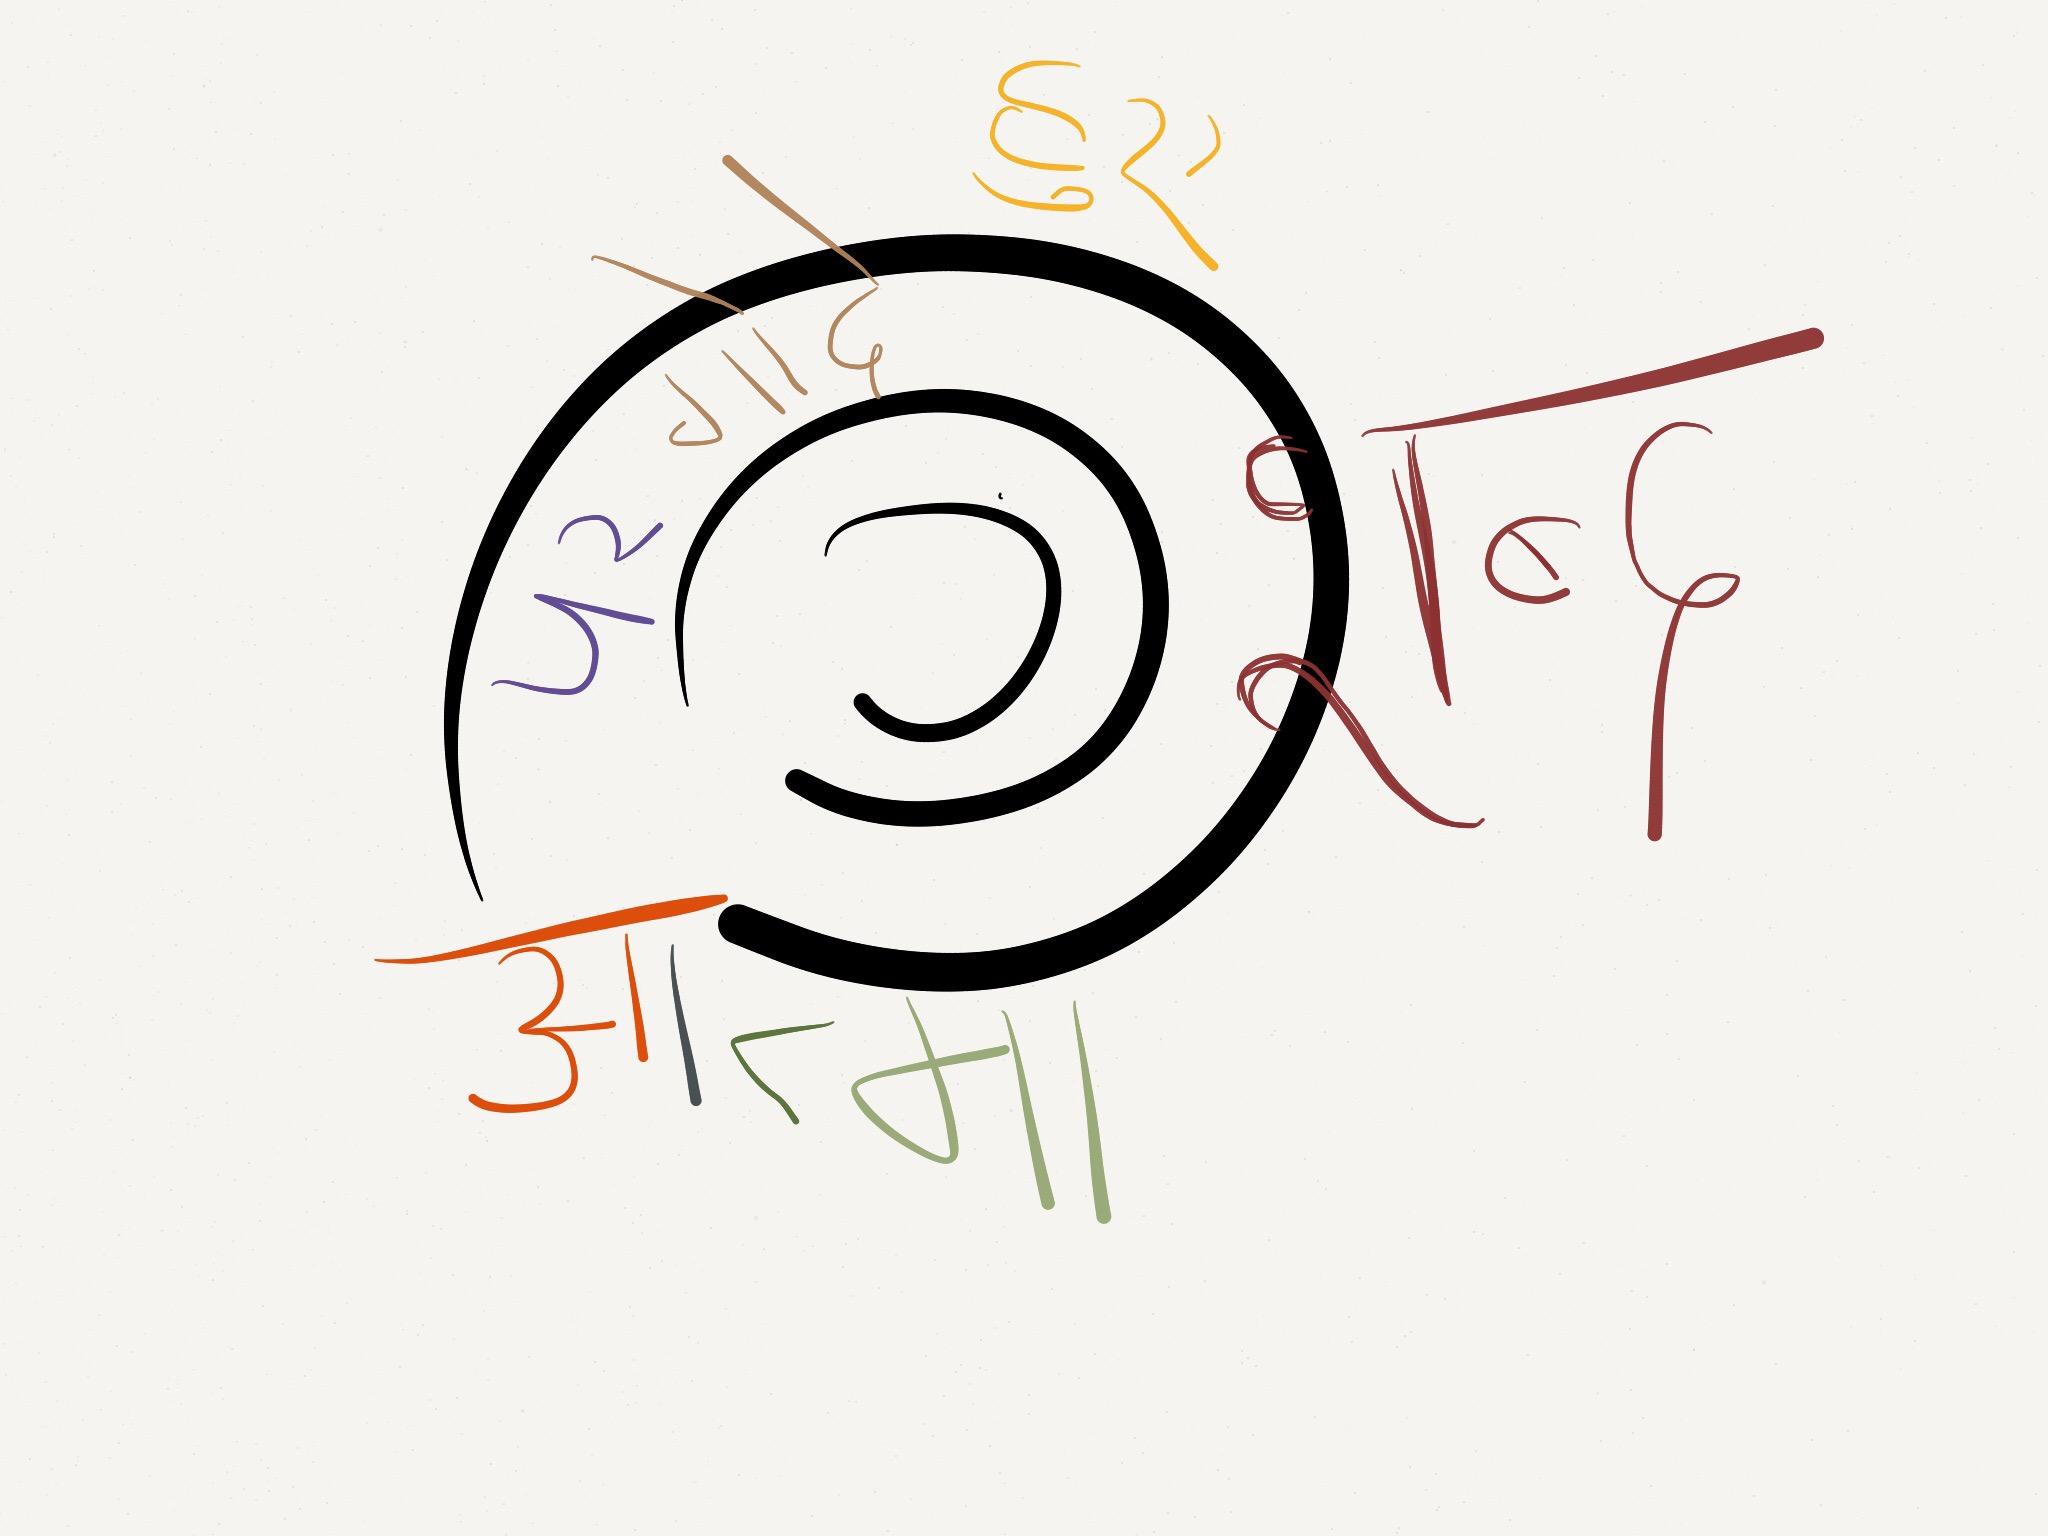 Digital Painting – Words tattooed onsoul